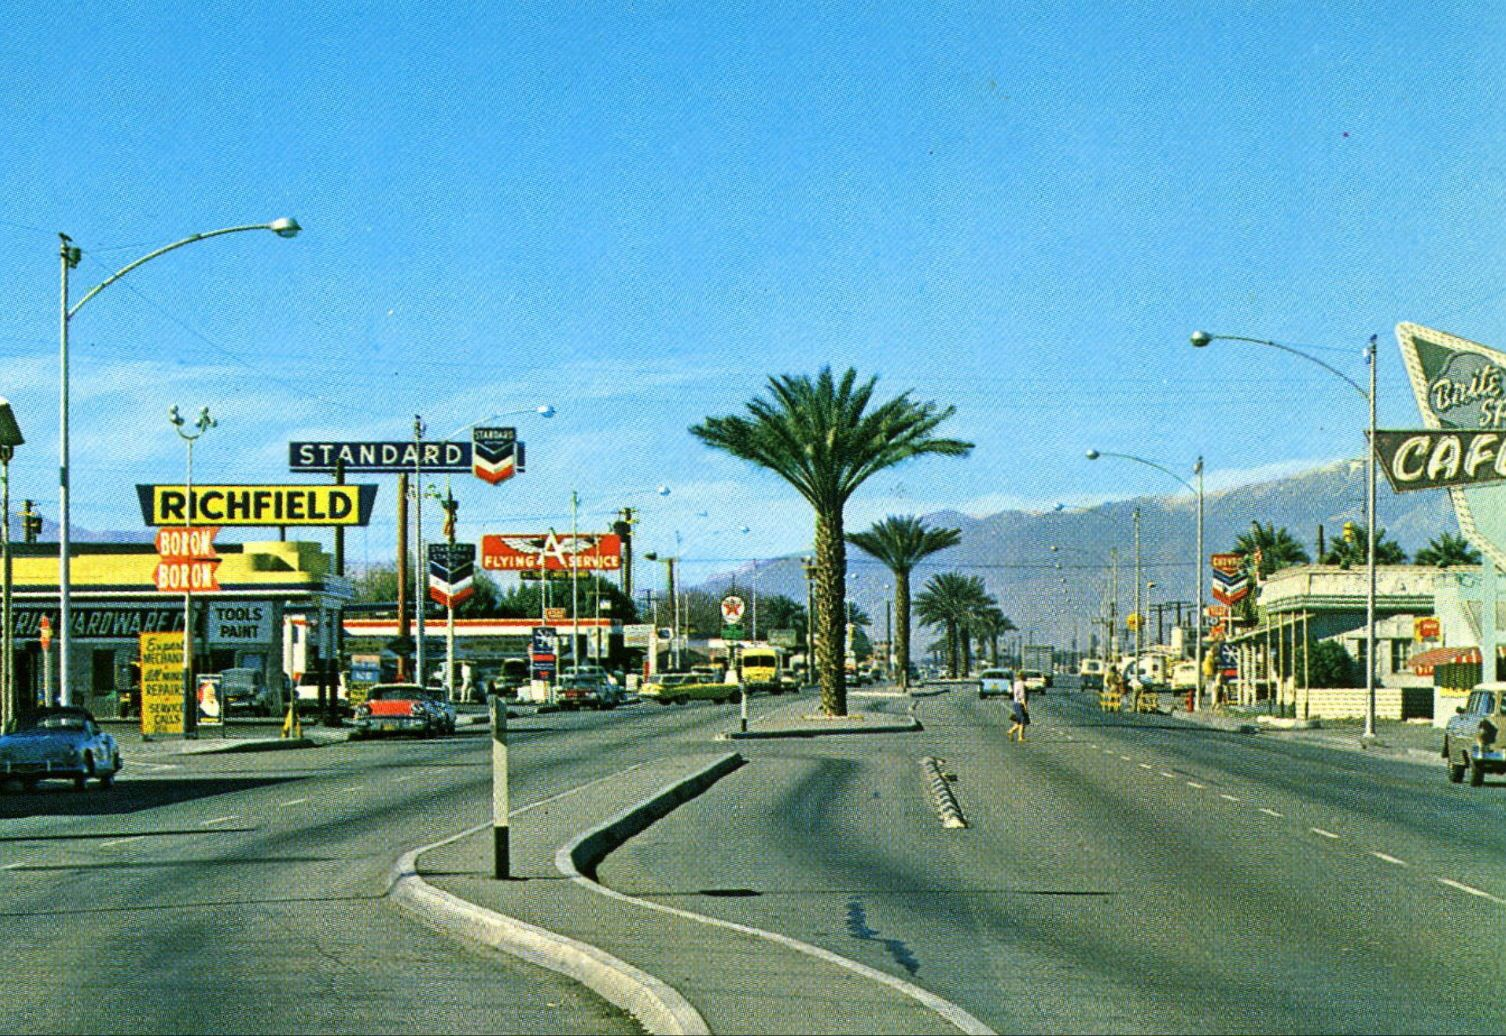 Personals in coachella ca Escort Palm Springs CA , escort girls in Palm Springs CA